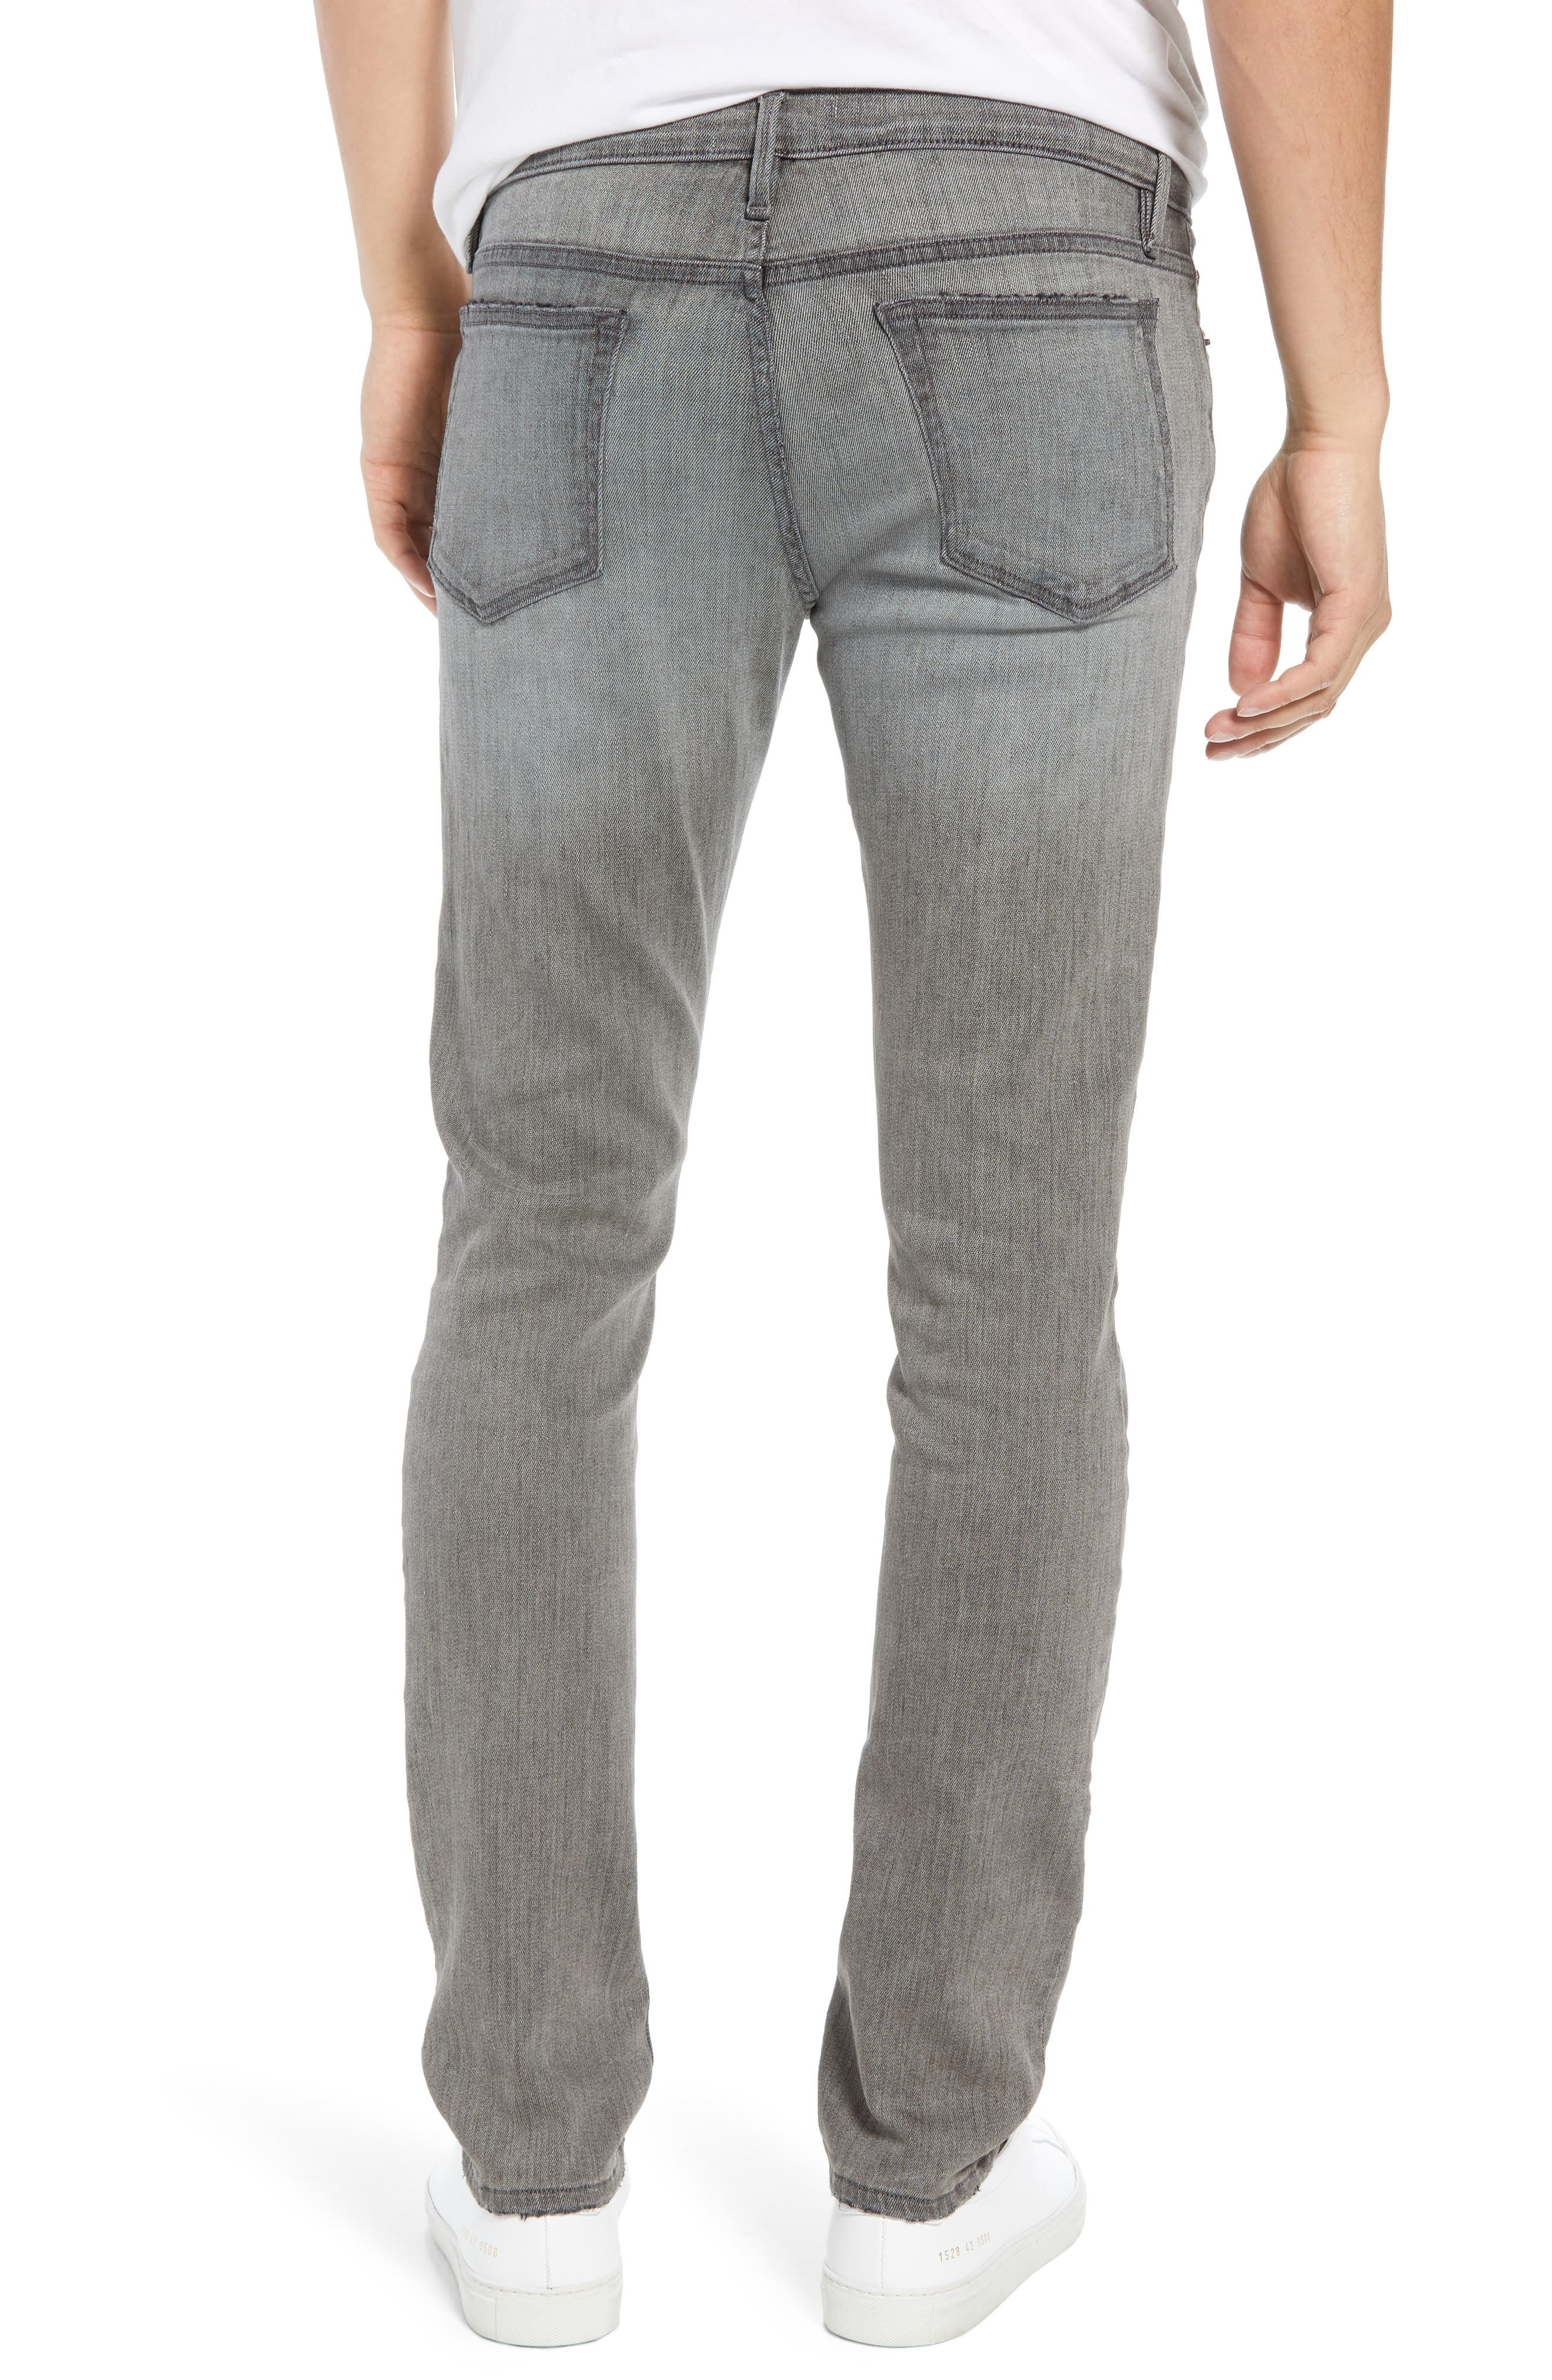 L'Homme Skinny Skinny Fit Jeans,                             Alternate thumbnail 2, color,                             FORT MCHEN